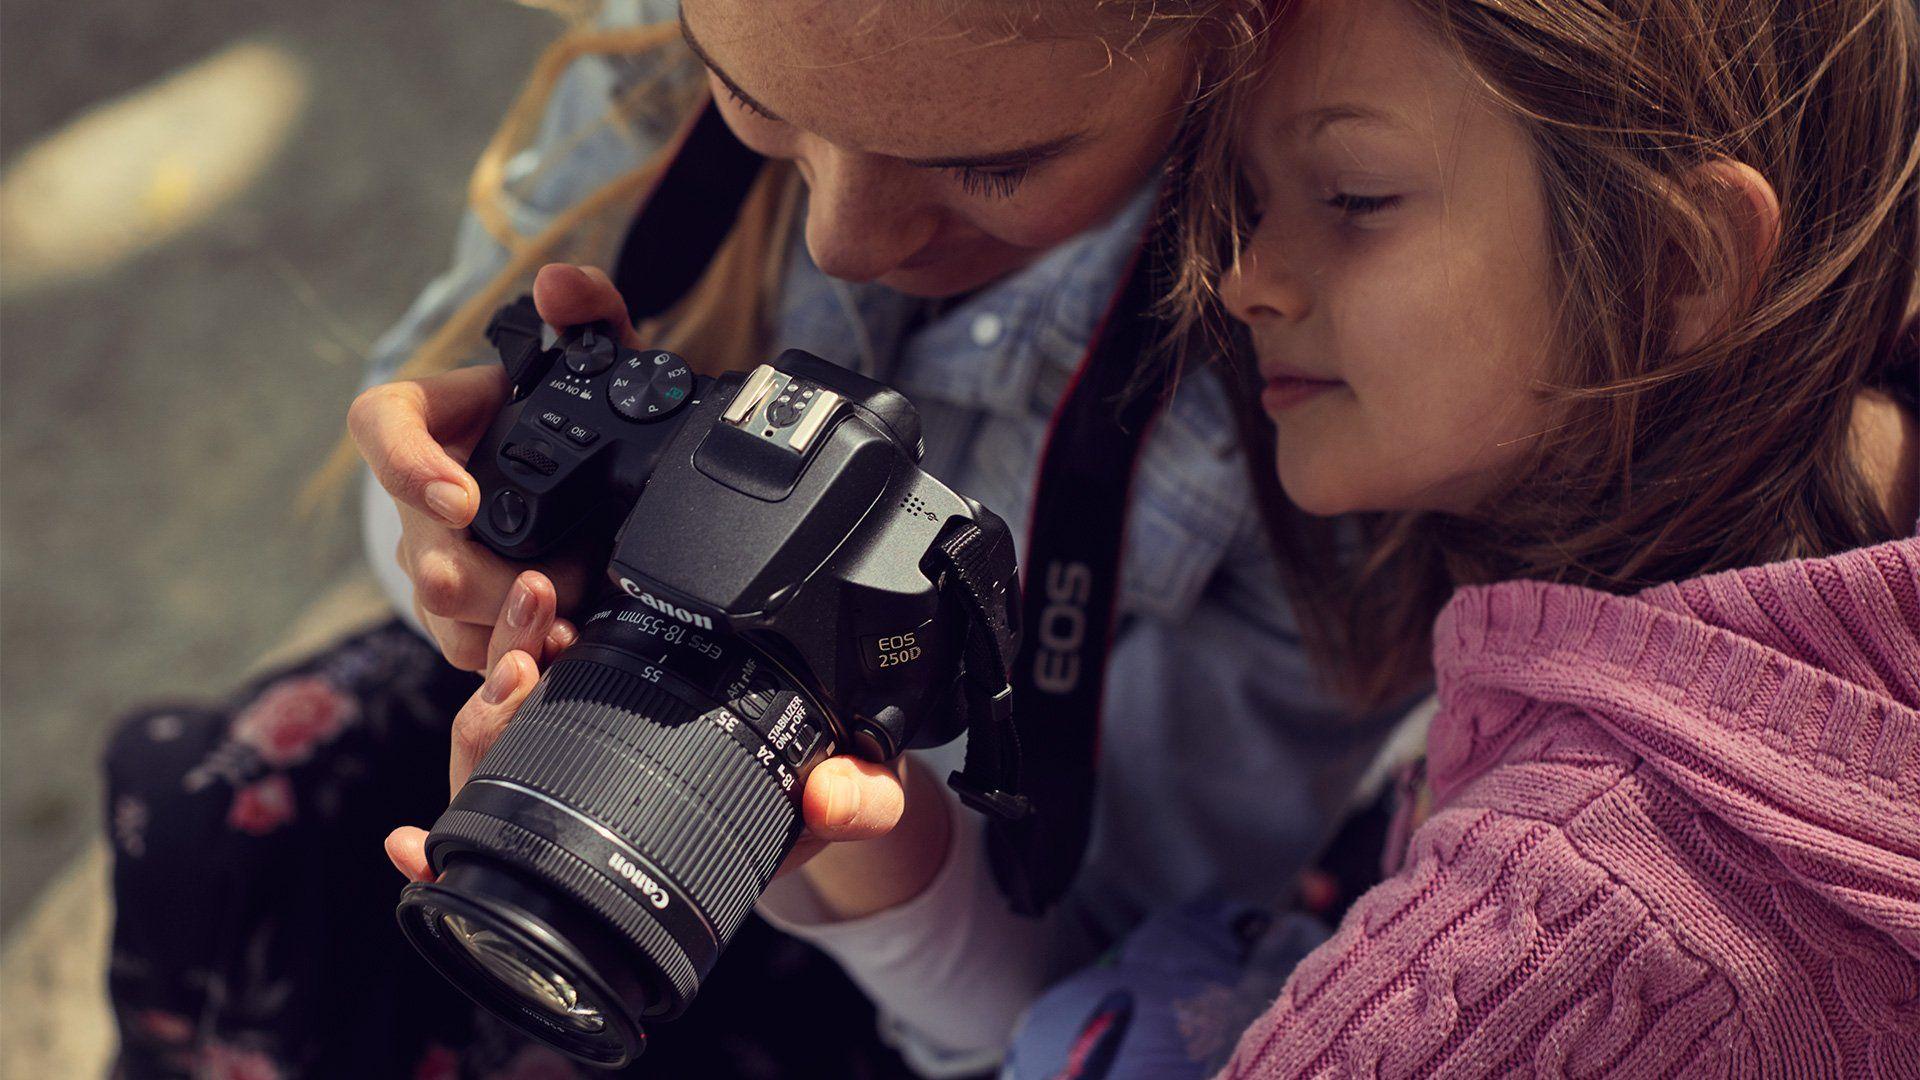 250d family photography 1 1920x1080 d3af94d2 7b91 11e9 ab6e b8ac6f21b630